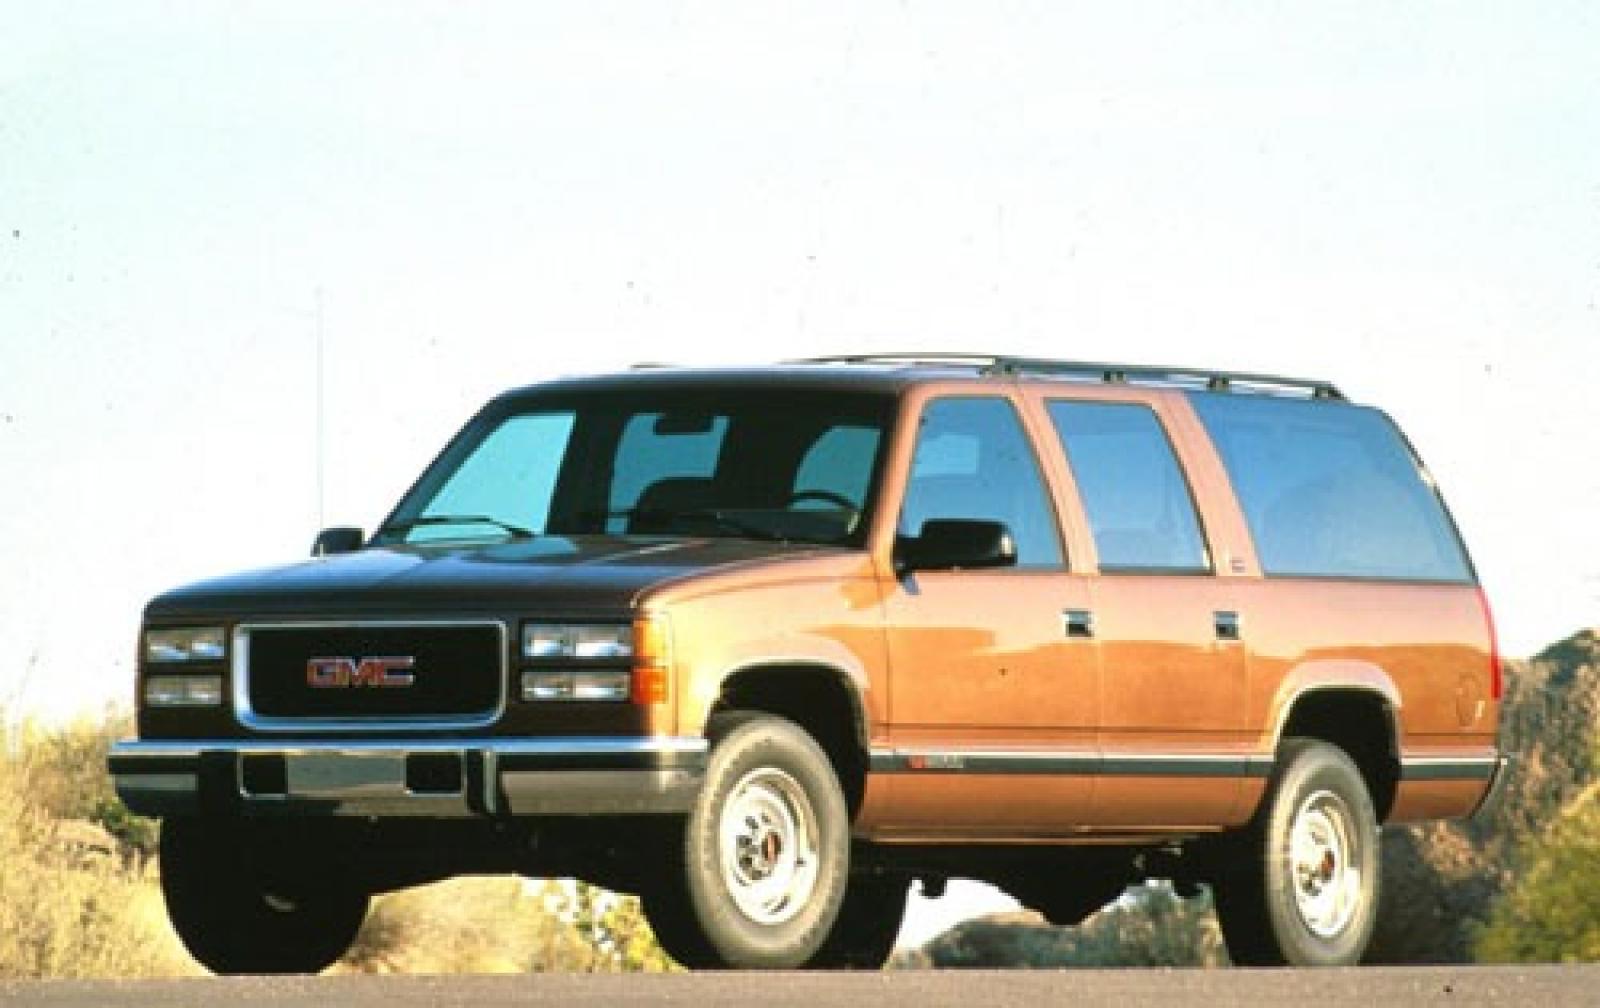 1994 gmc suburban 1 800 1024 1280 1600 origin